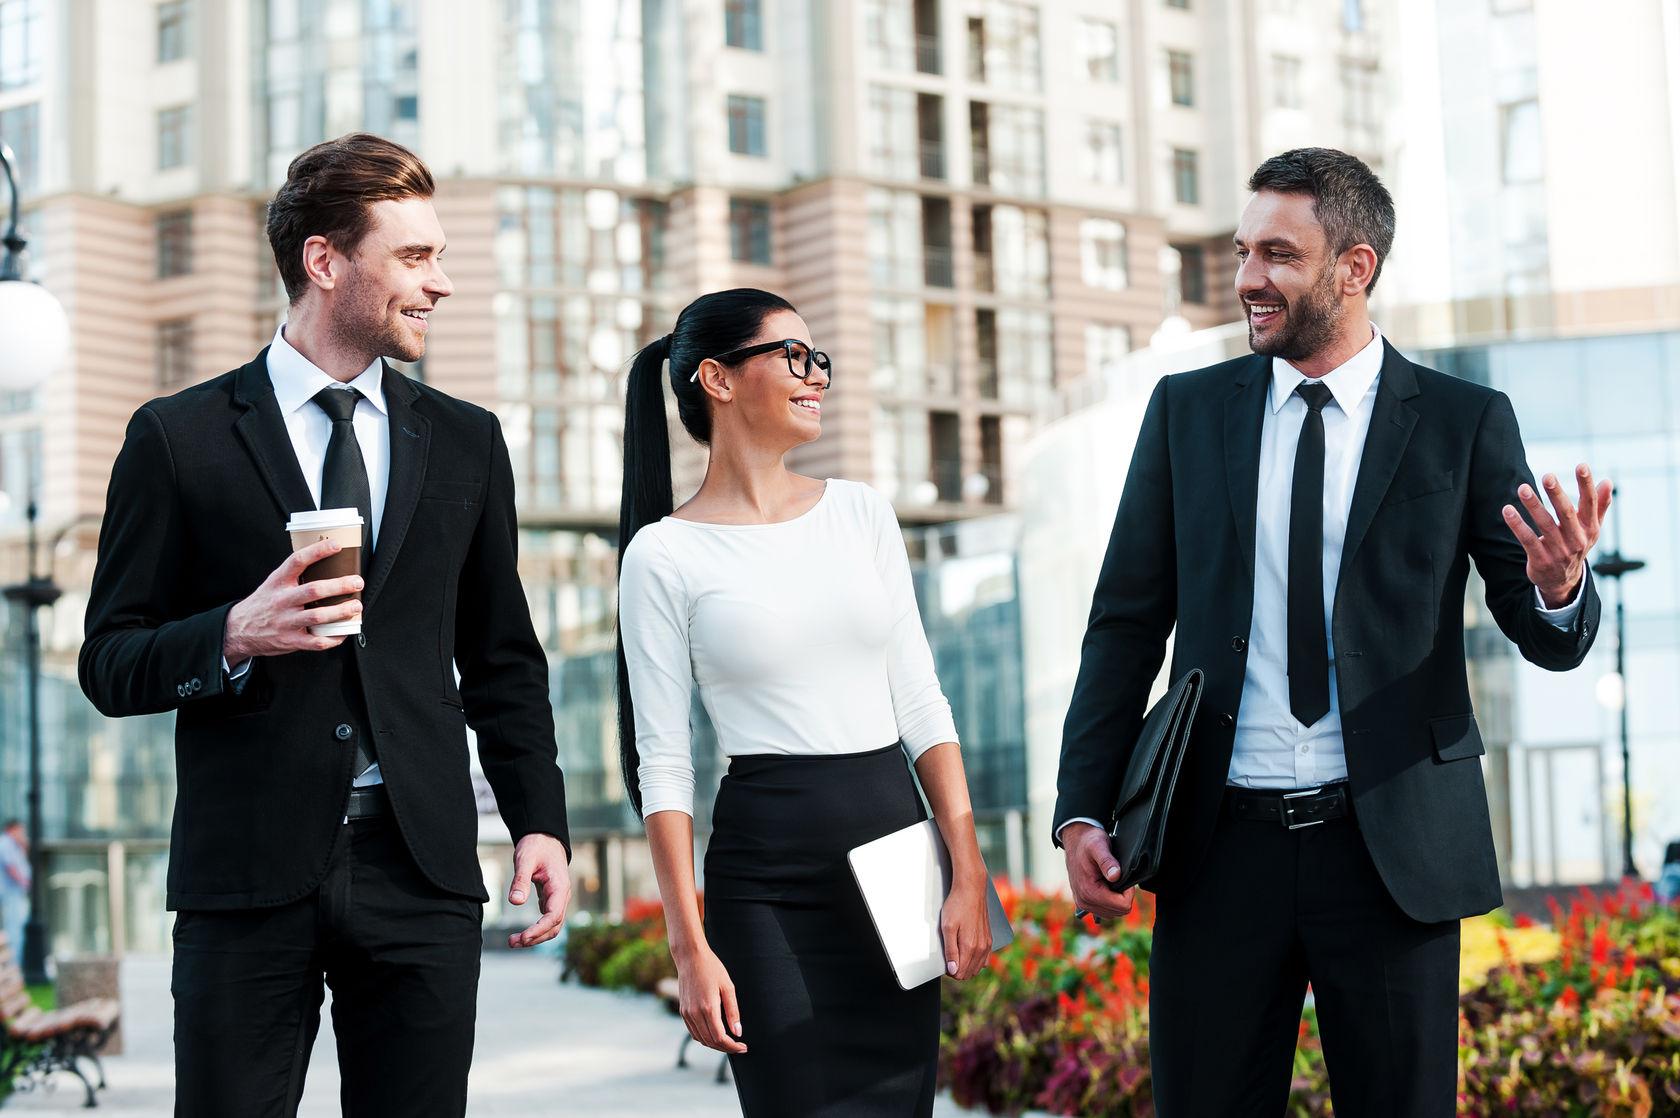 dress code in law career